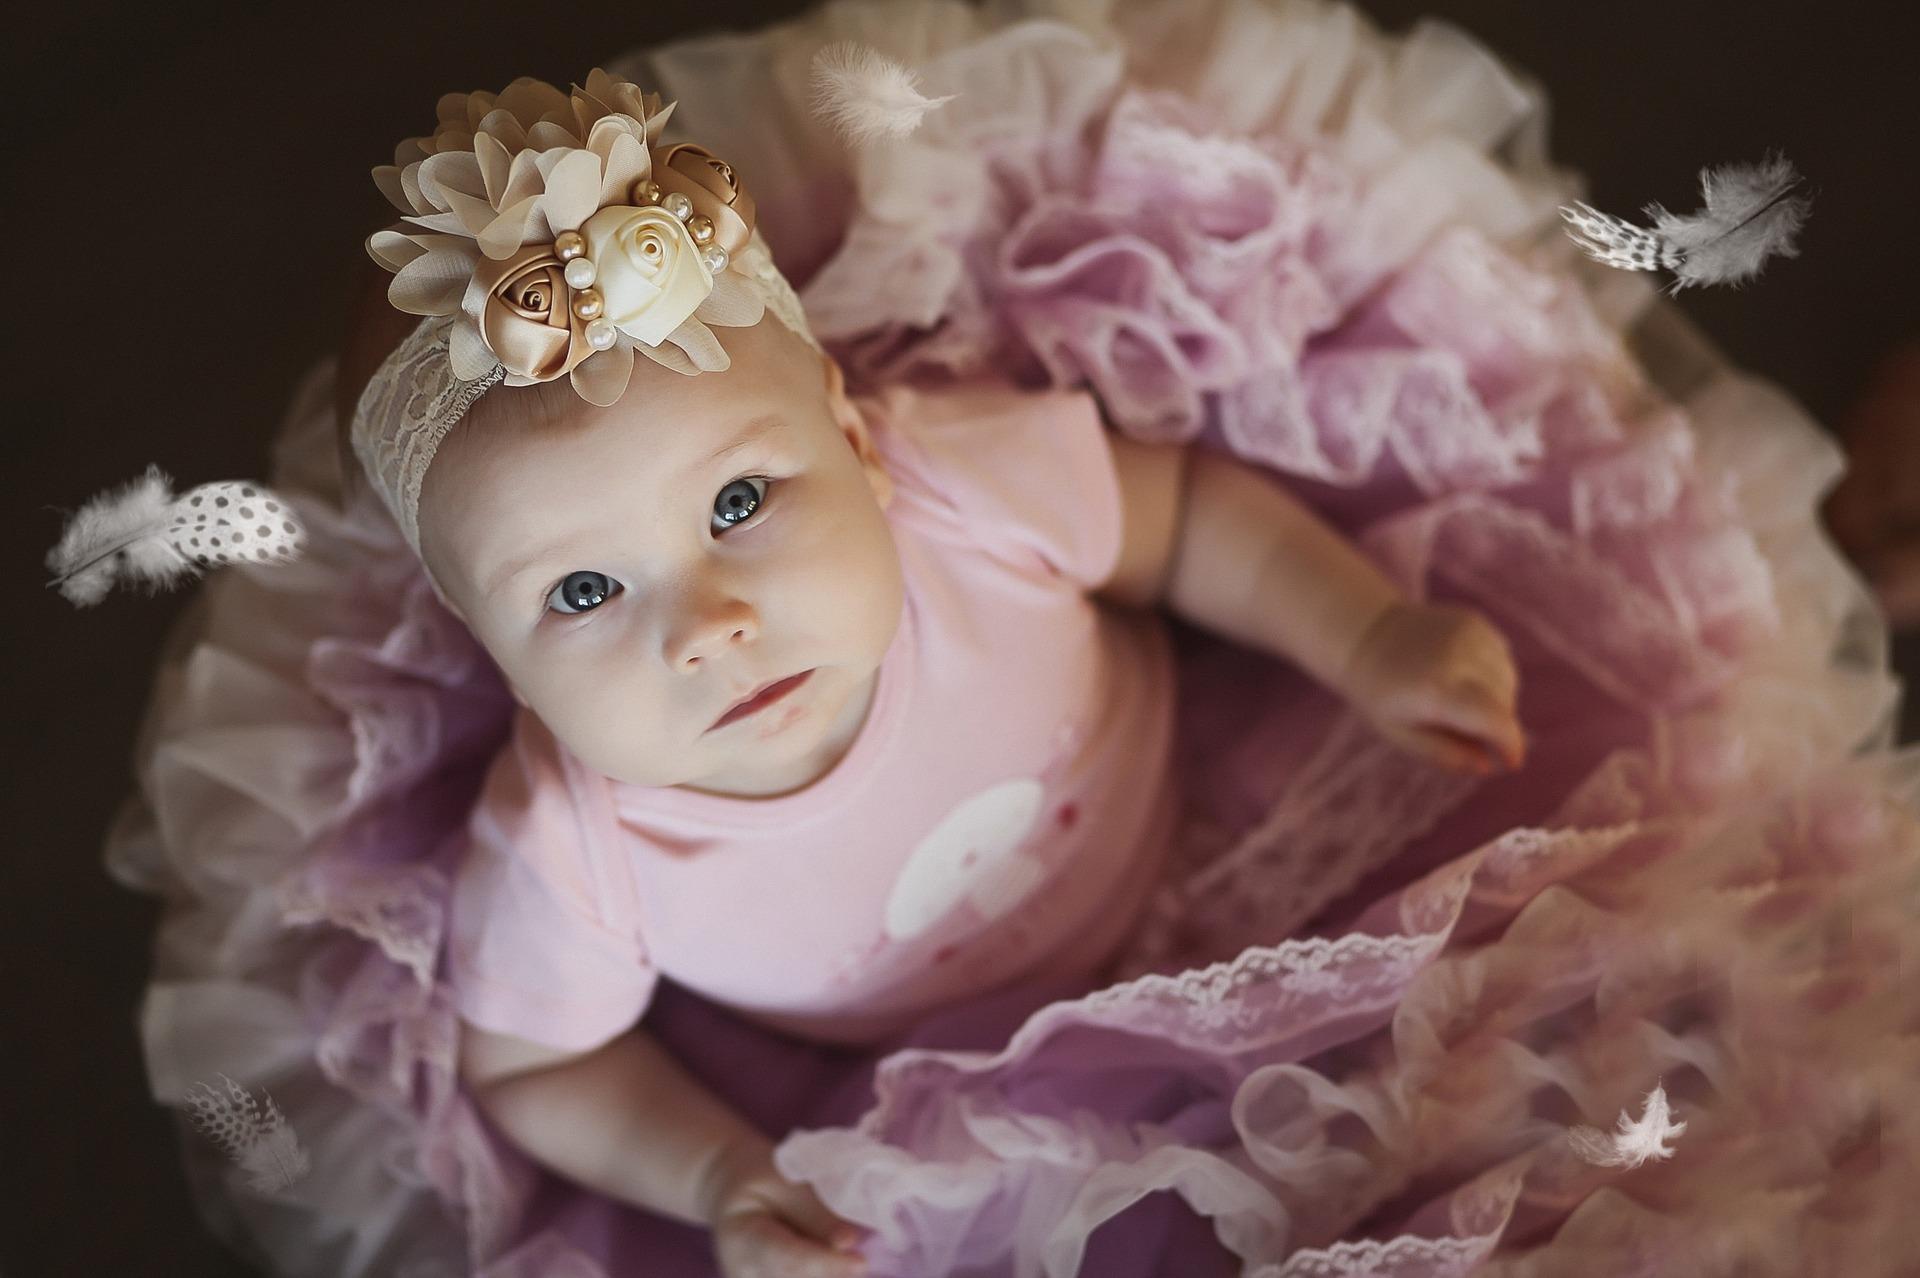 baby-752188_1920.jpg